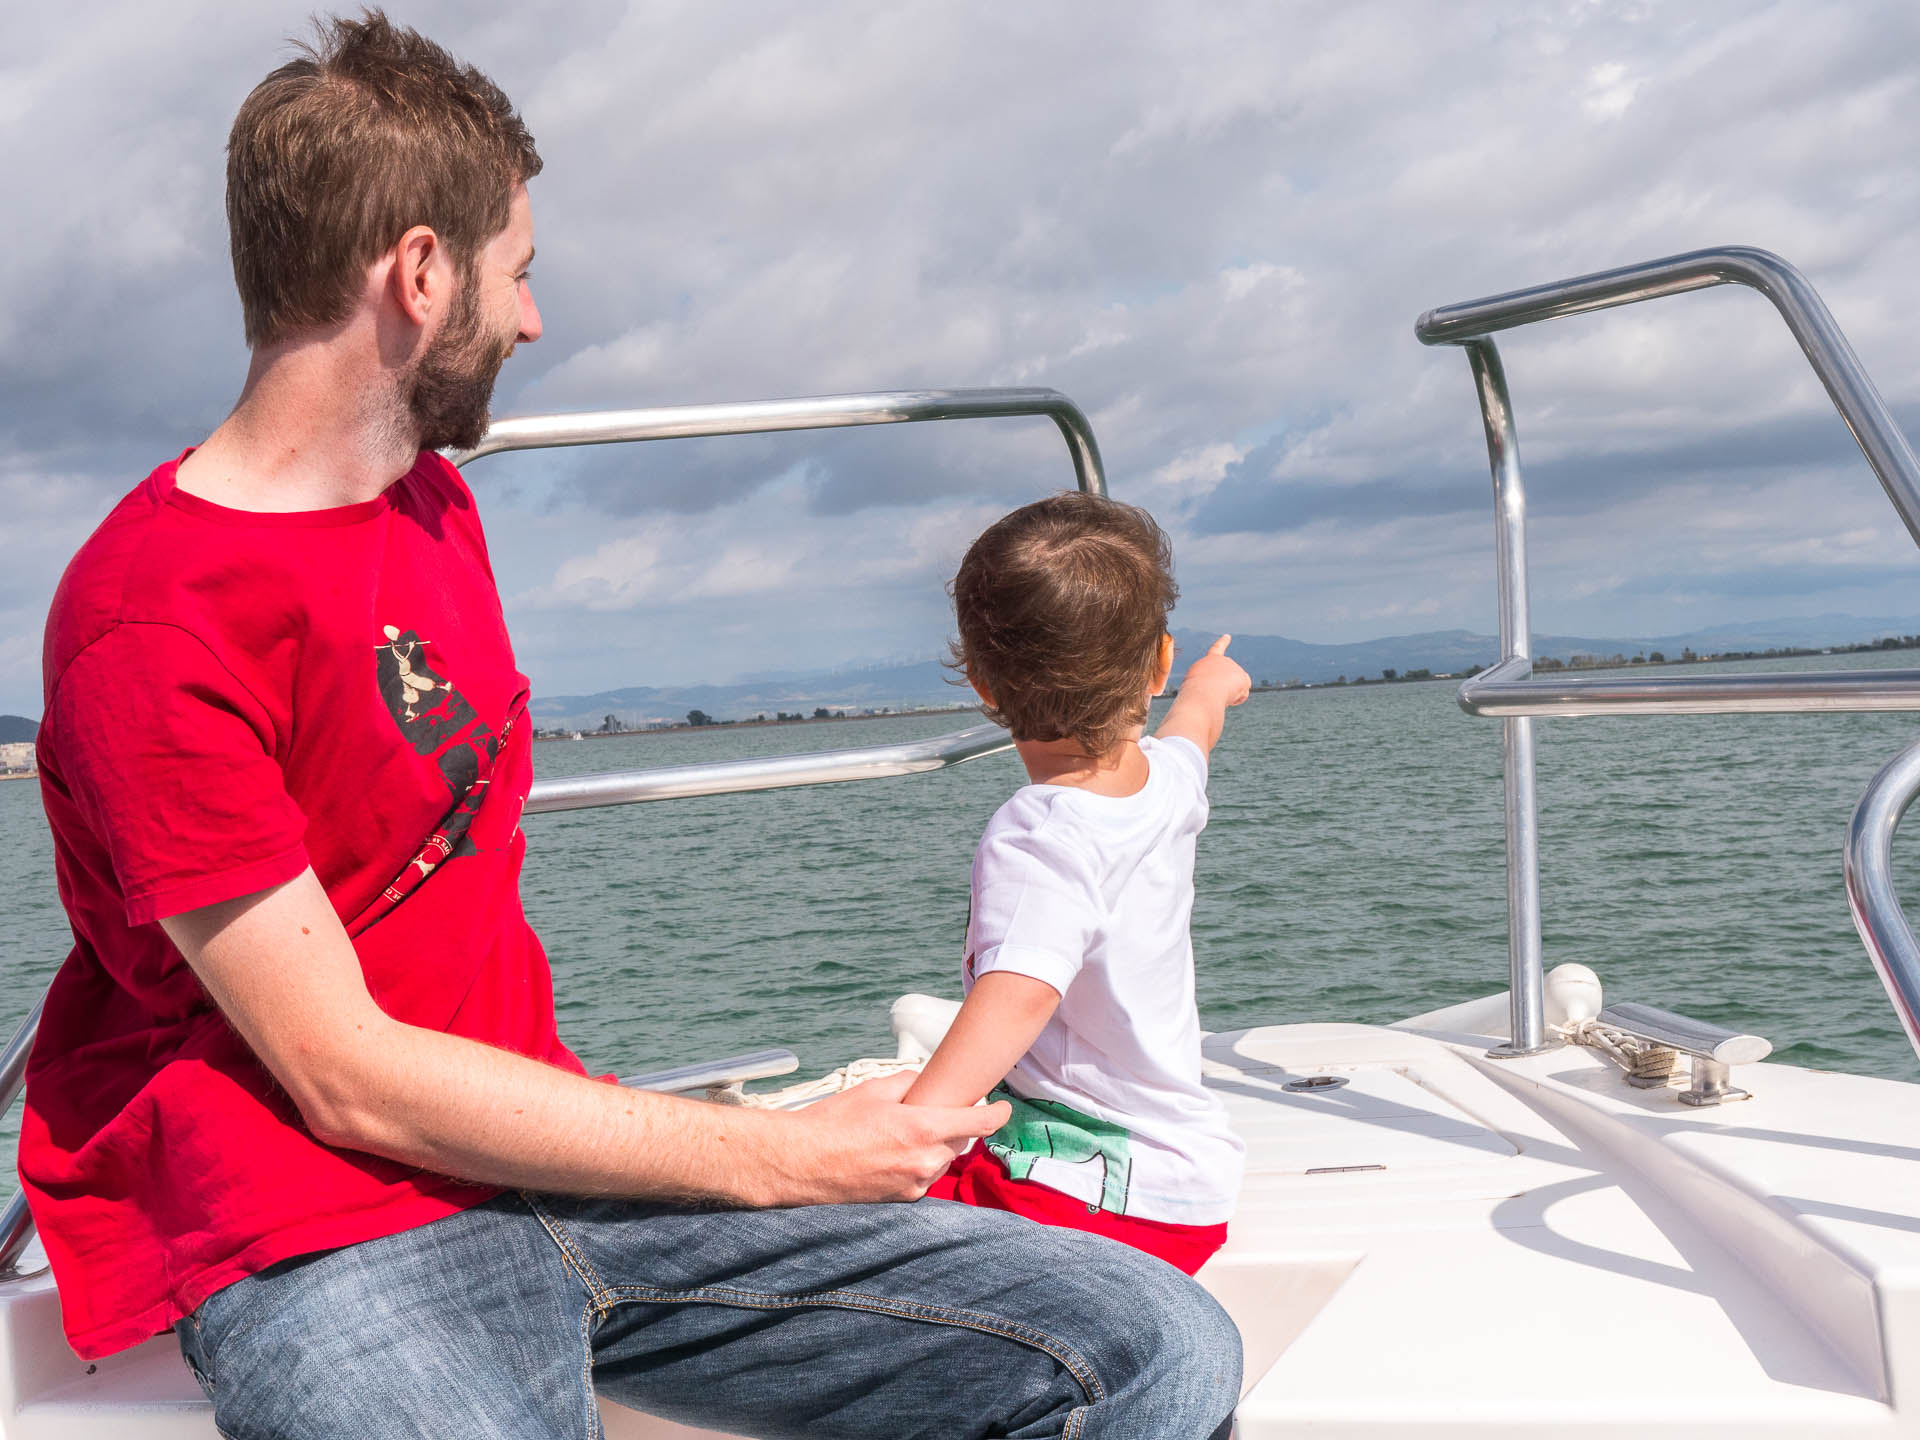 sant carles bateau seb helio - Les globe blogueurs - blog voyage nature